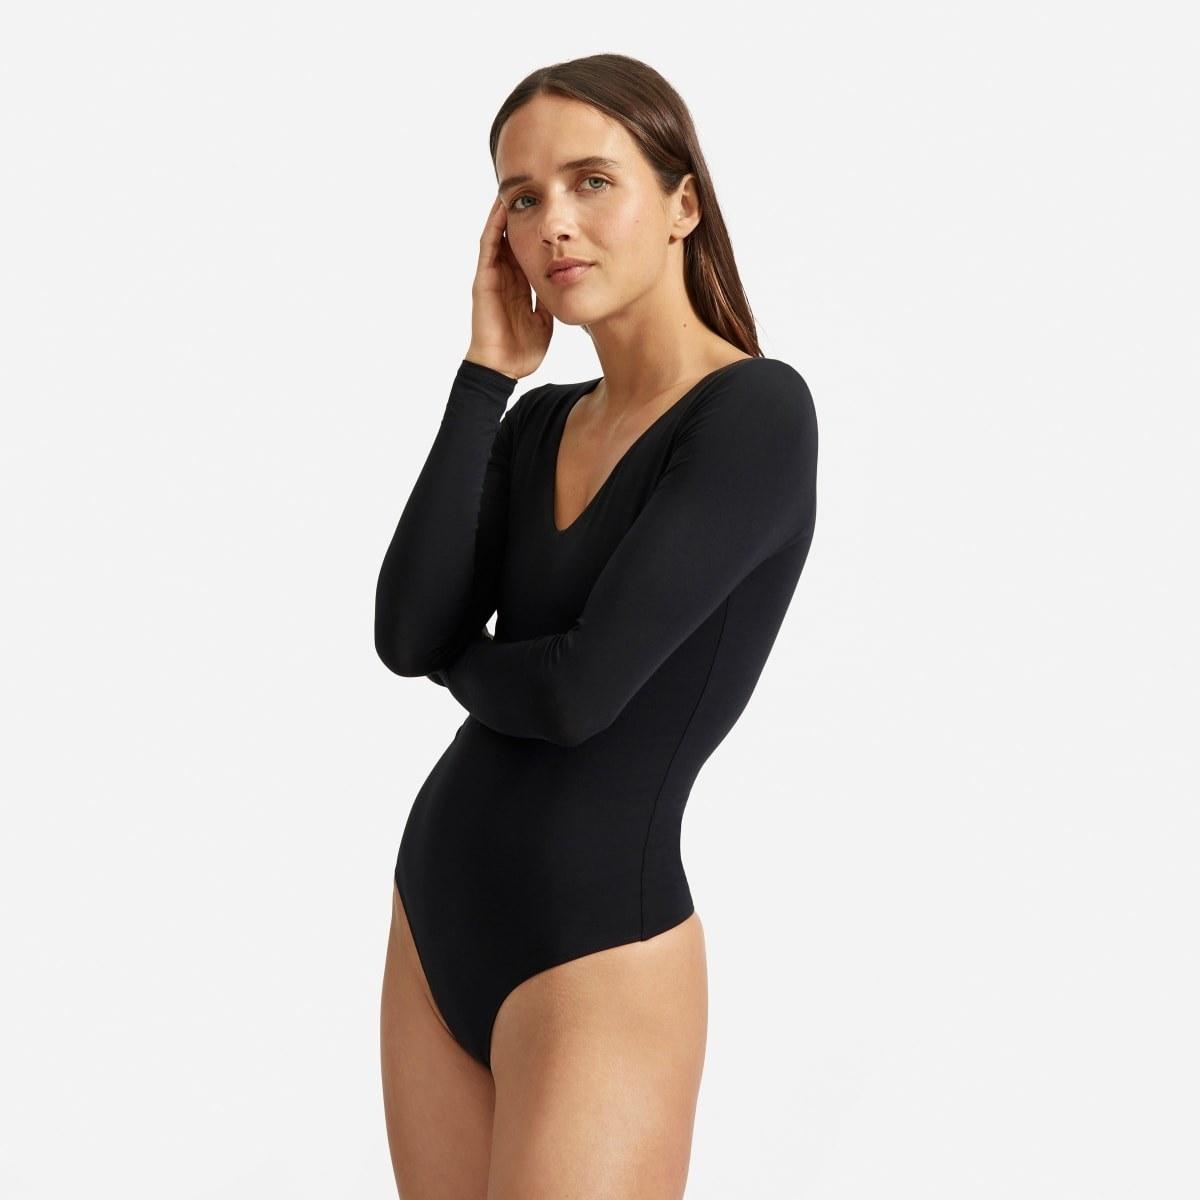 A model wearing the black long-sleeved thong bodysuit